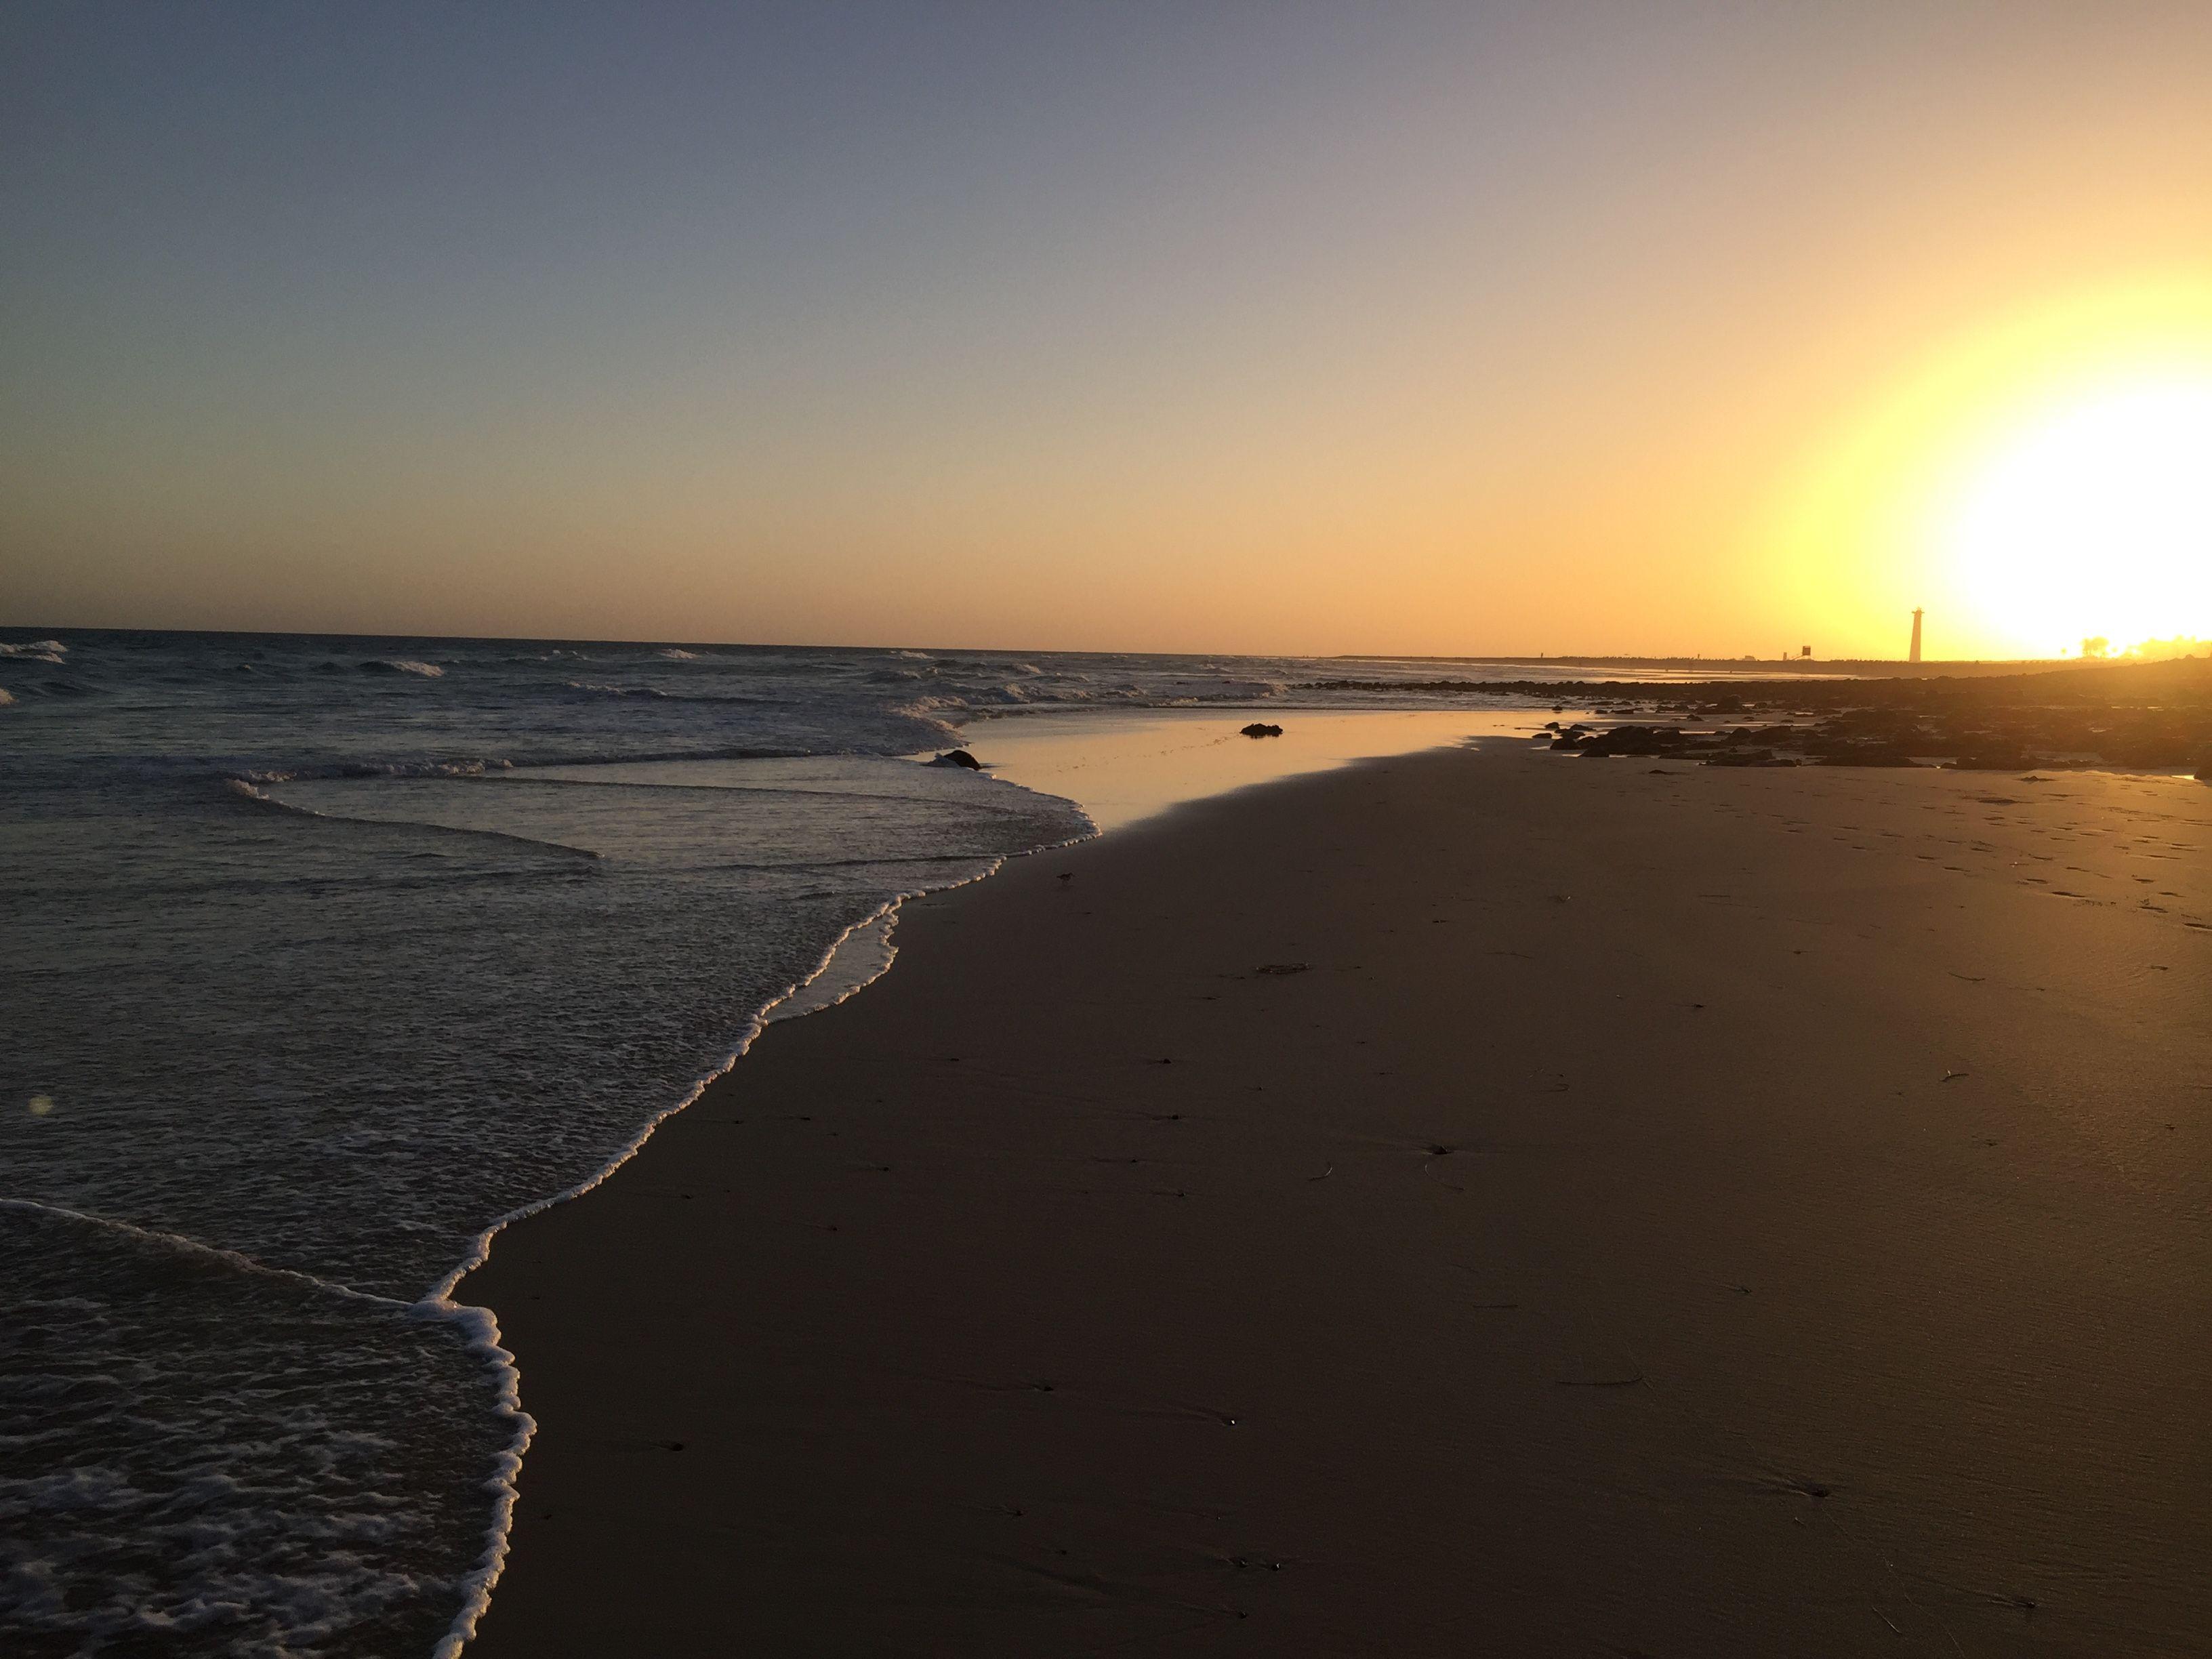 Sonnenuntergang auf Fuerteventura. Jandia Fuerteventura